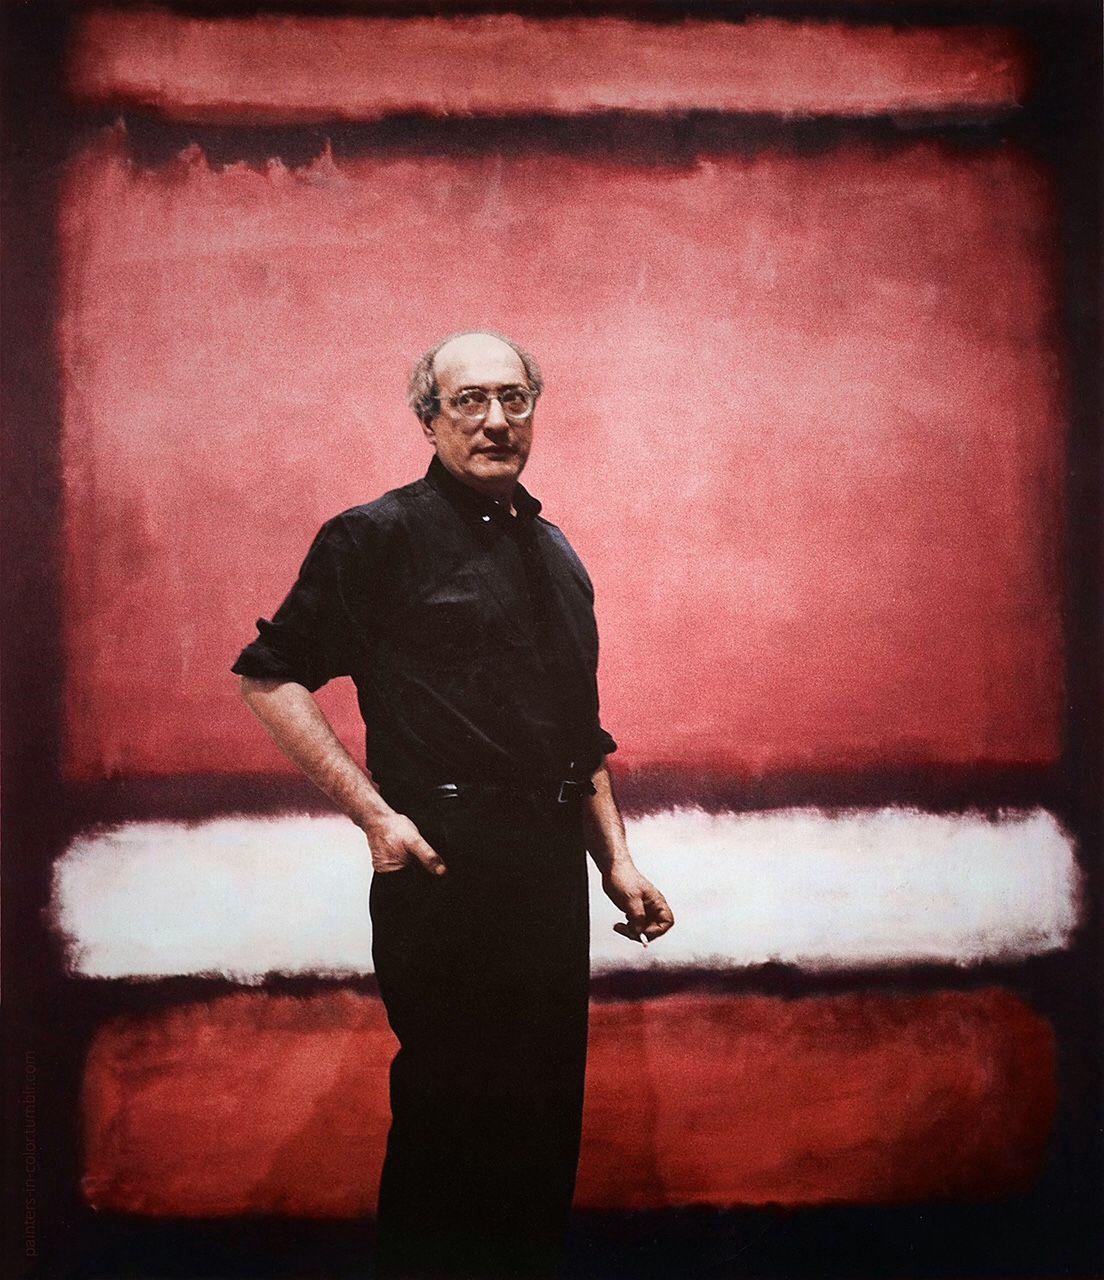 Rothko-New-portrait-photo-color